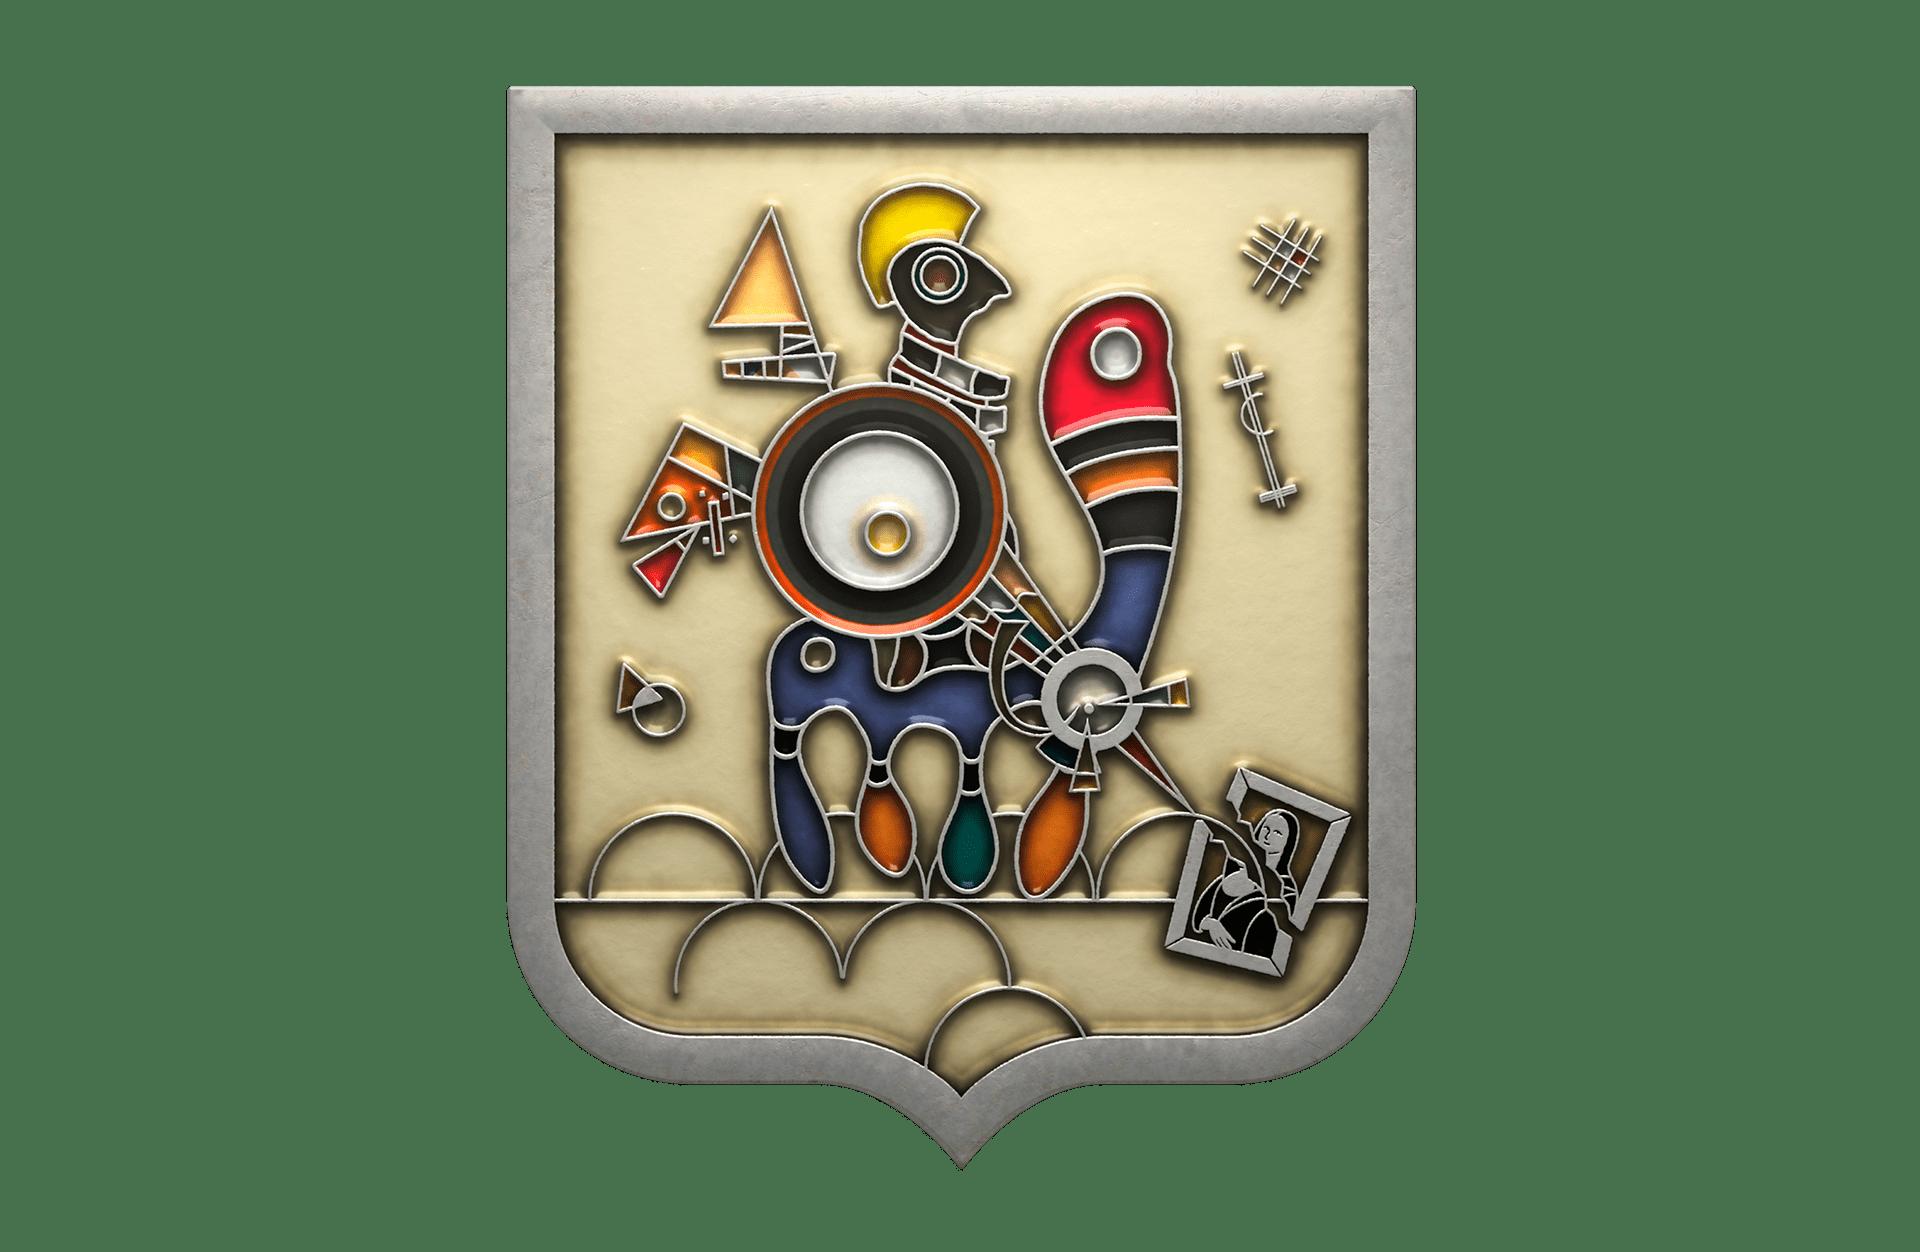 25 - Новый герб Москвы